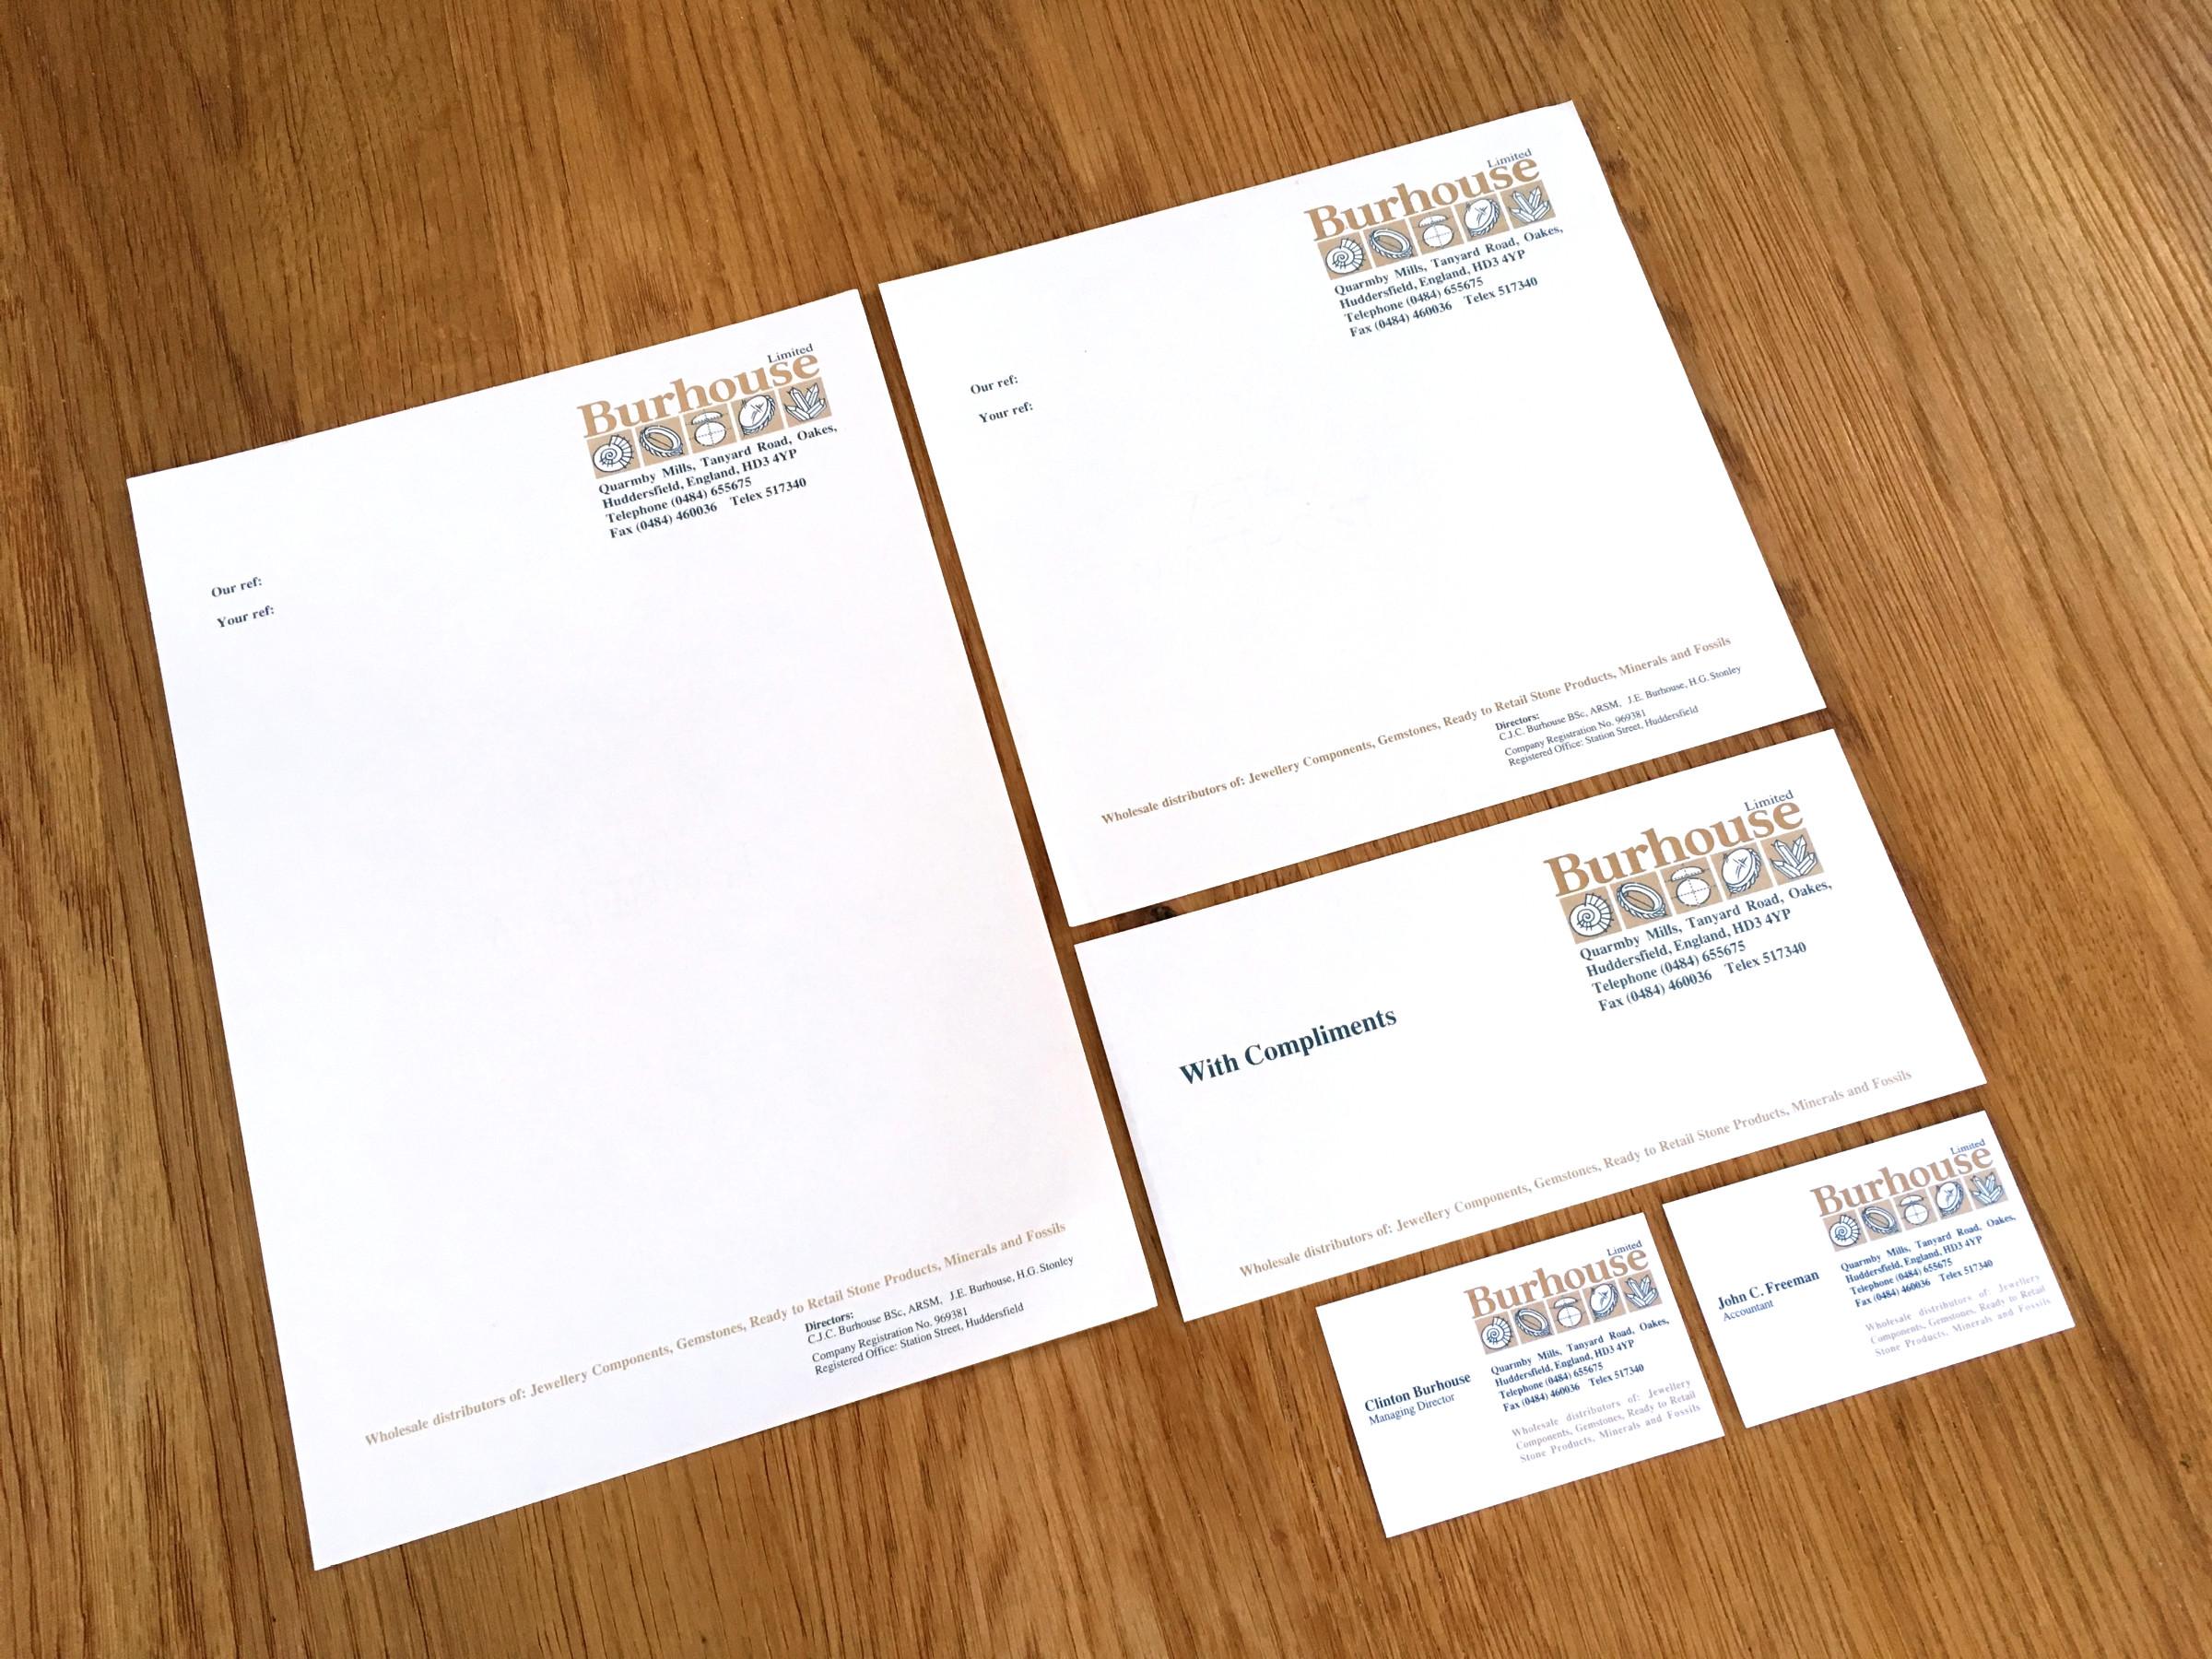 Burhouse stationery.jpg